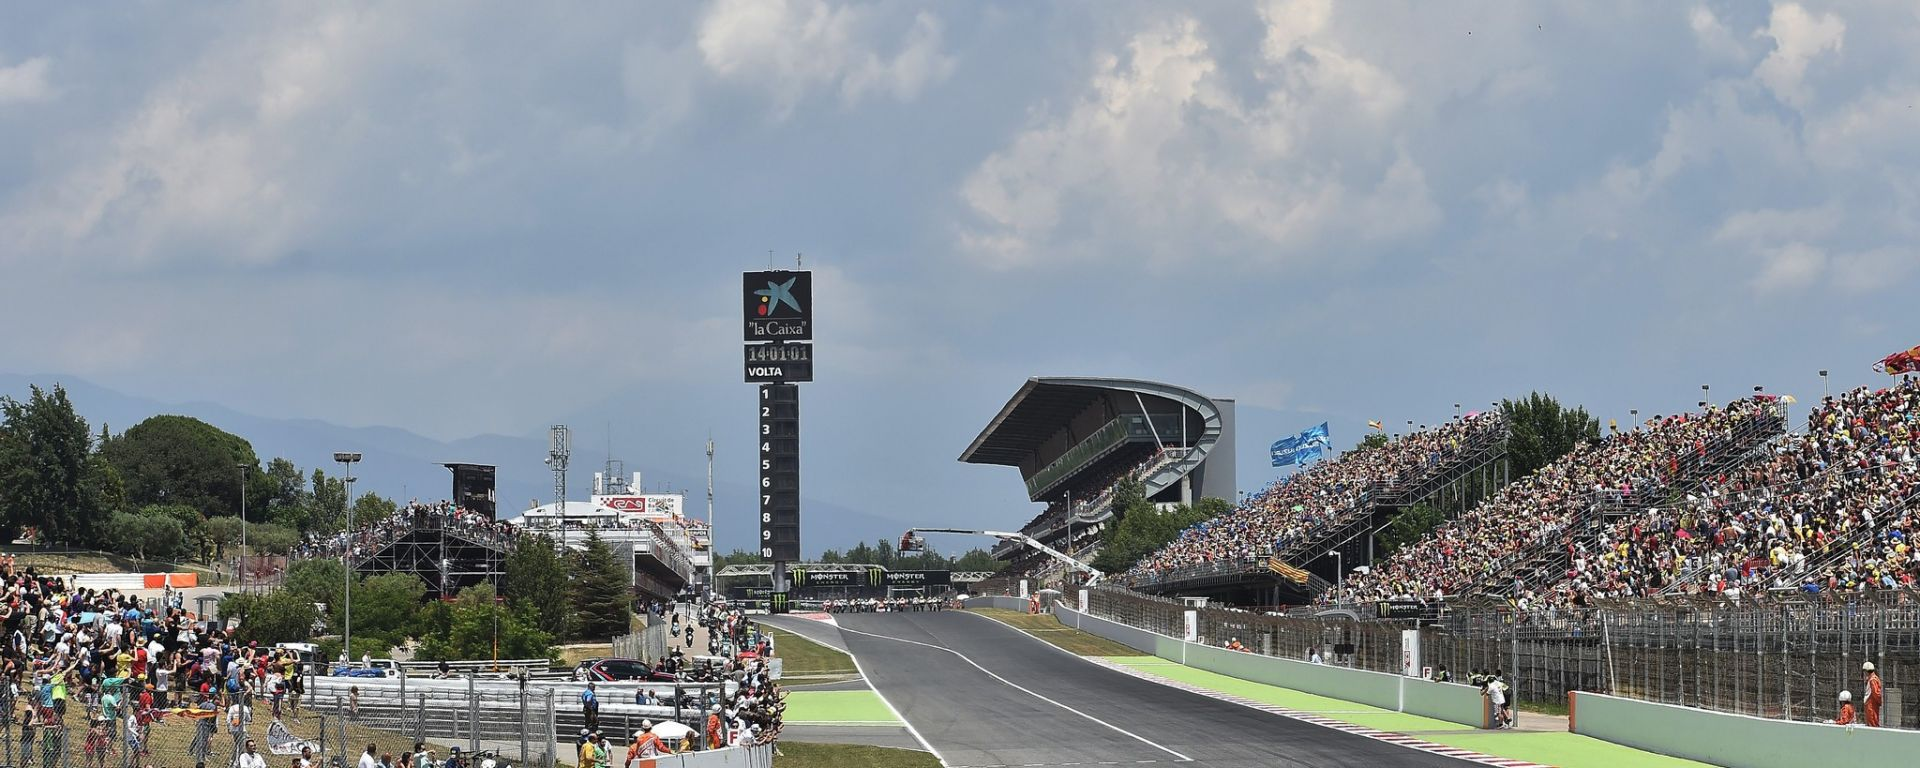 MotoGP Catalunya Spagna: Prove libere, qualifiche, risultati gara